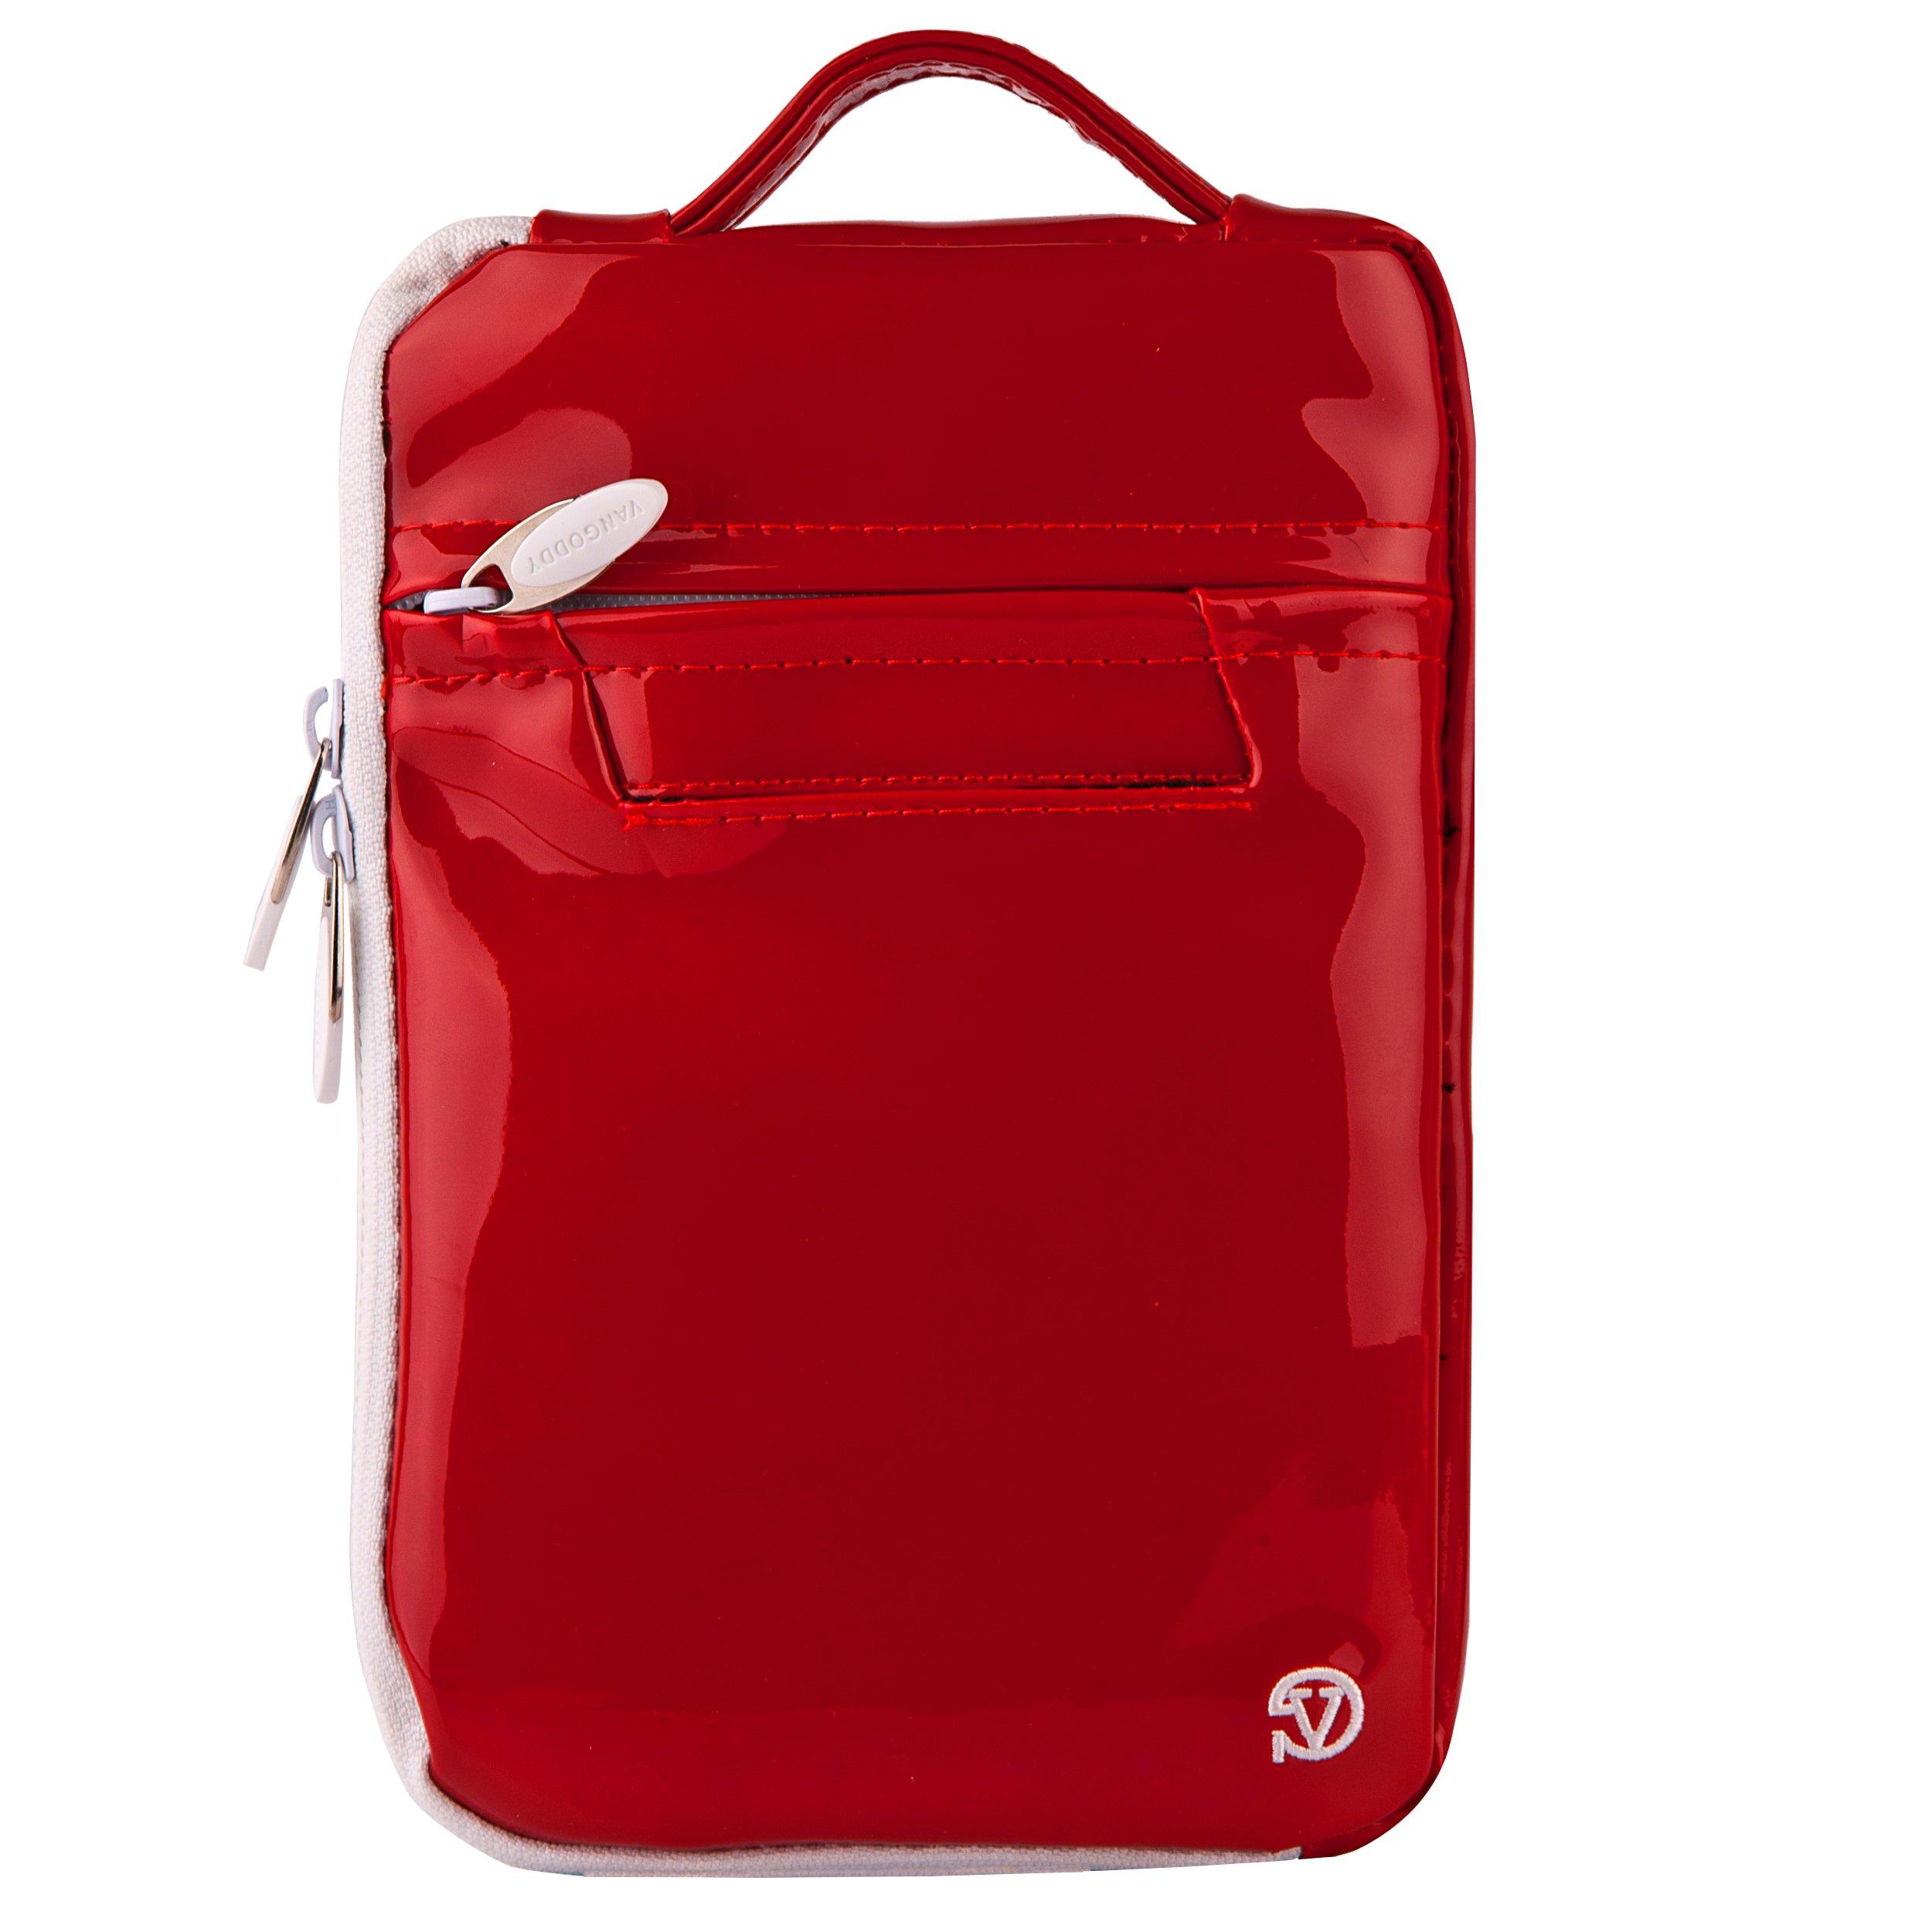 Red Social Media Lightweight Travel Case for HP Sprocket Portable Photo Printer